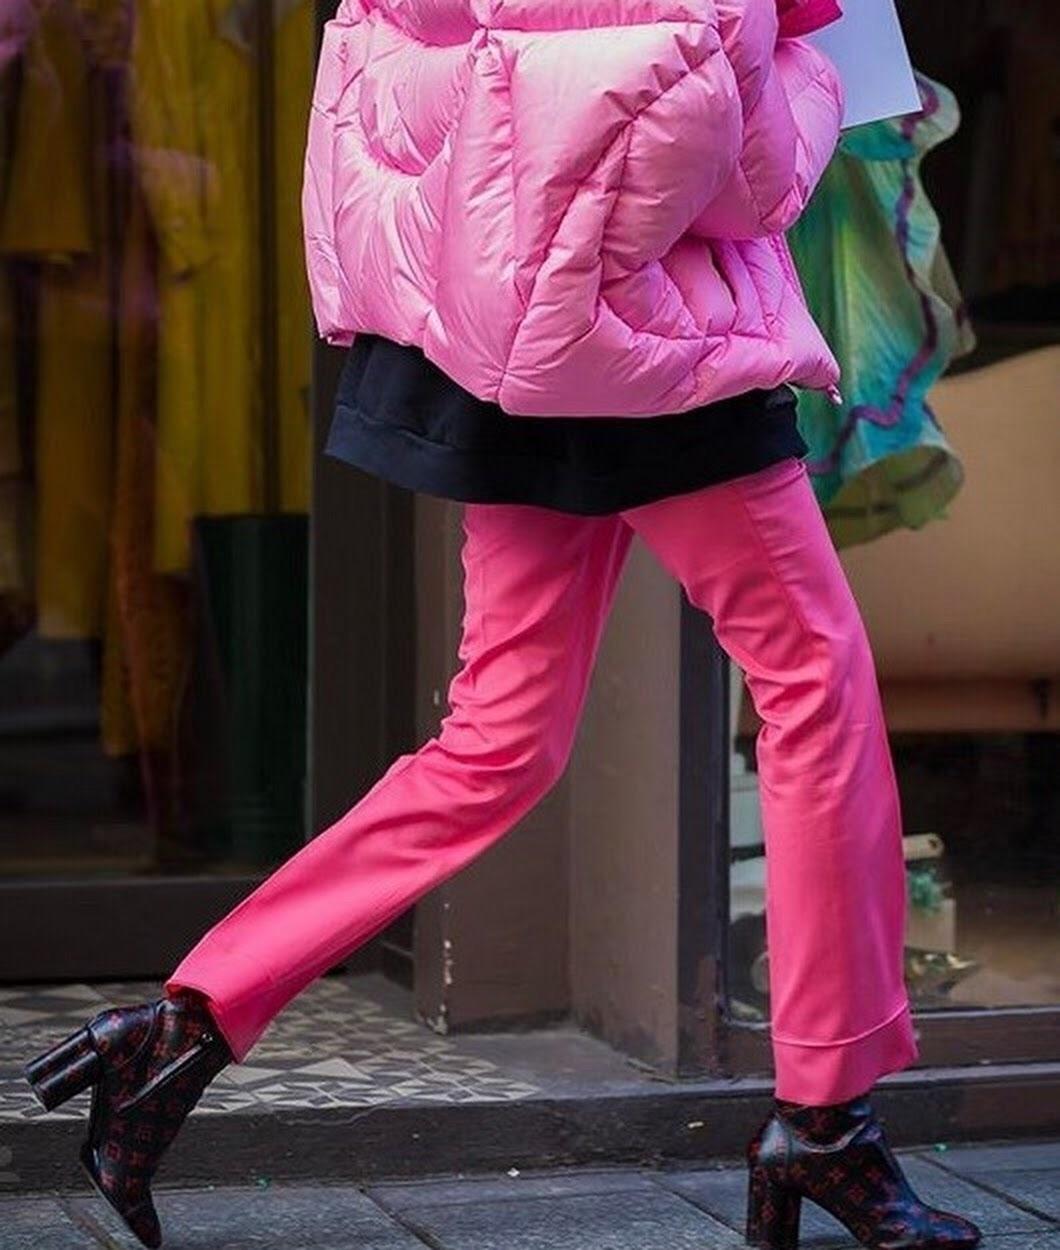 Street Style 2017 - mariaelisacruzlima | ello